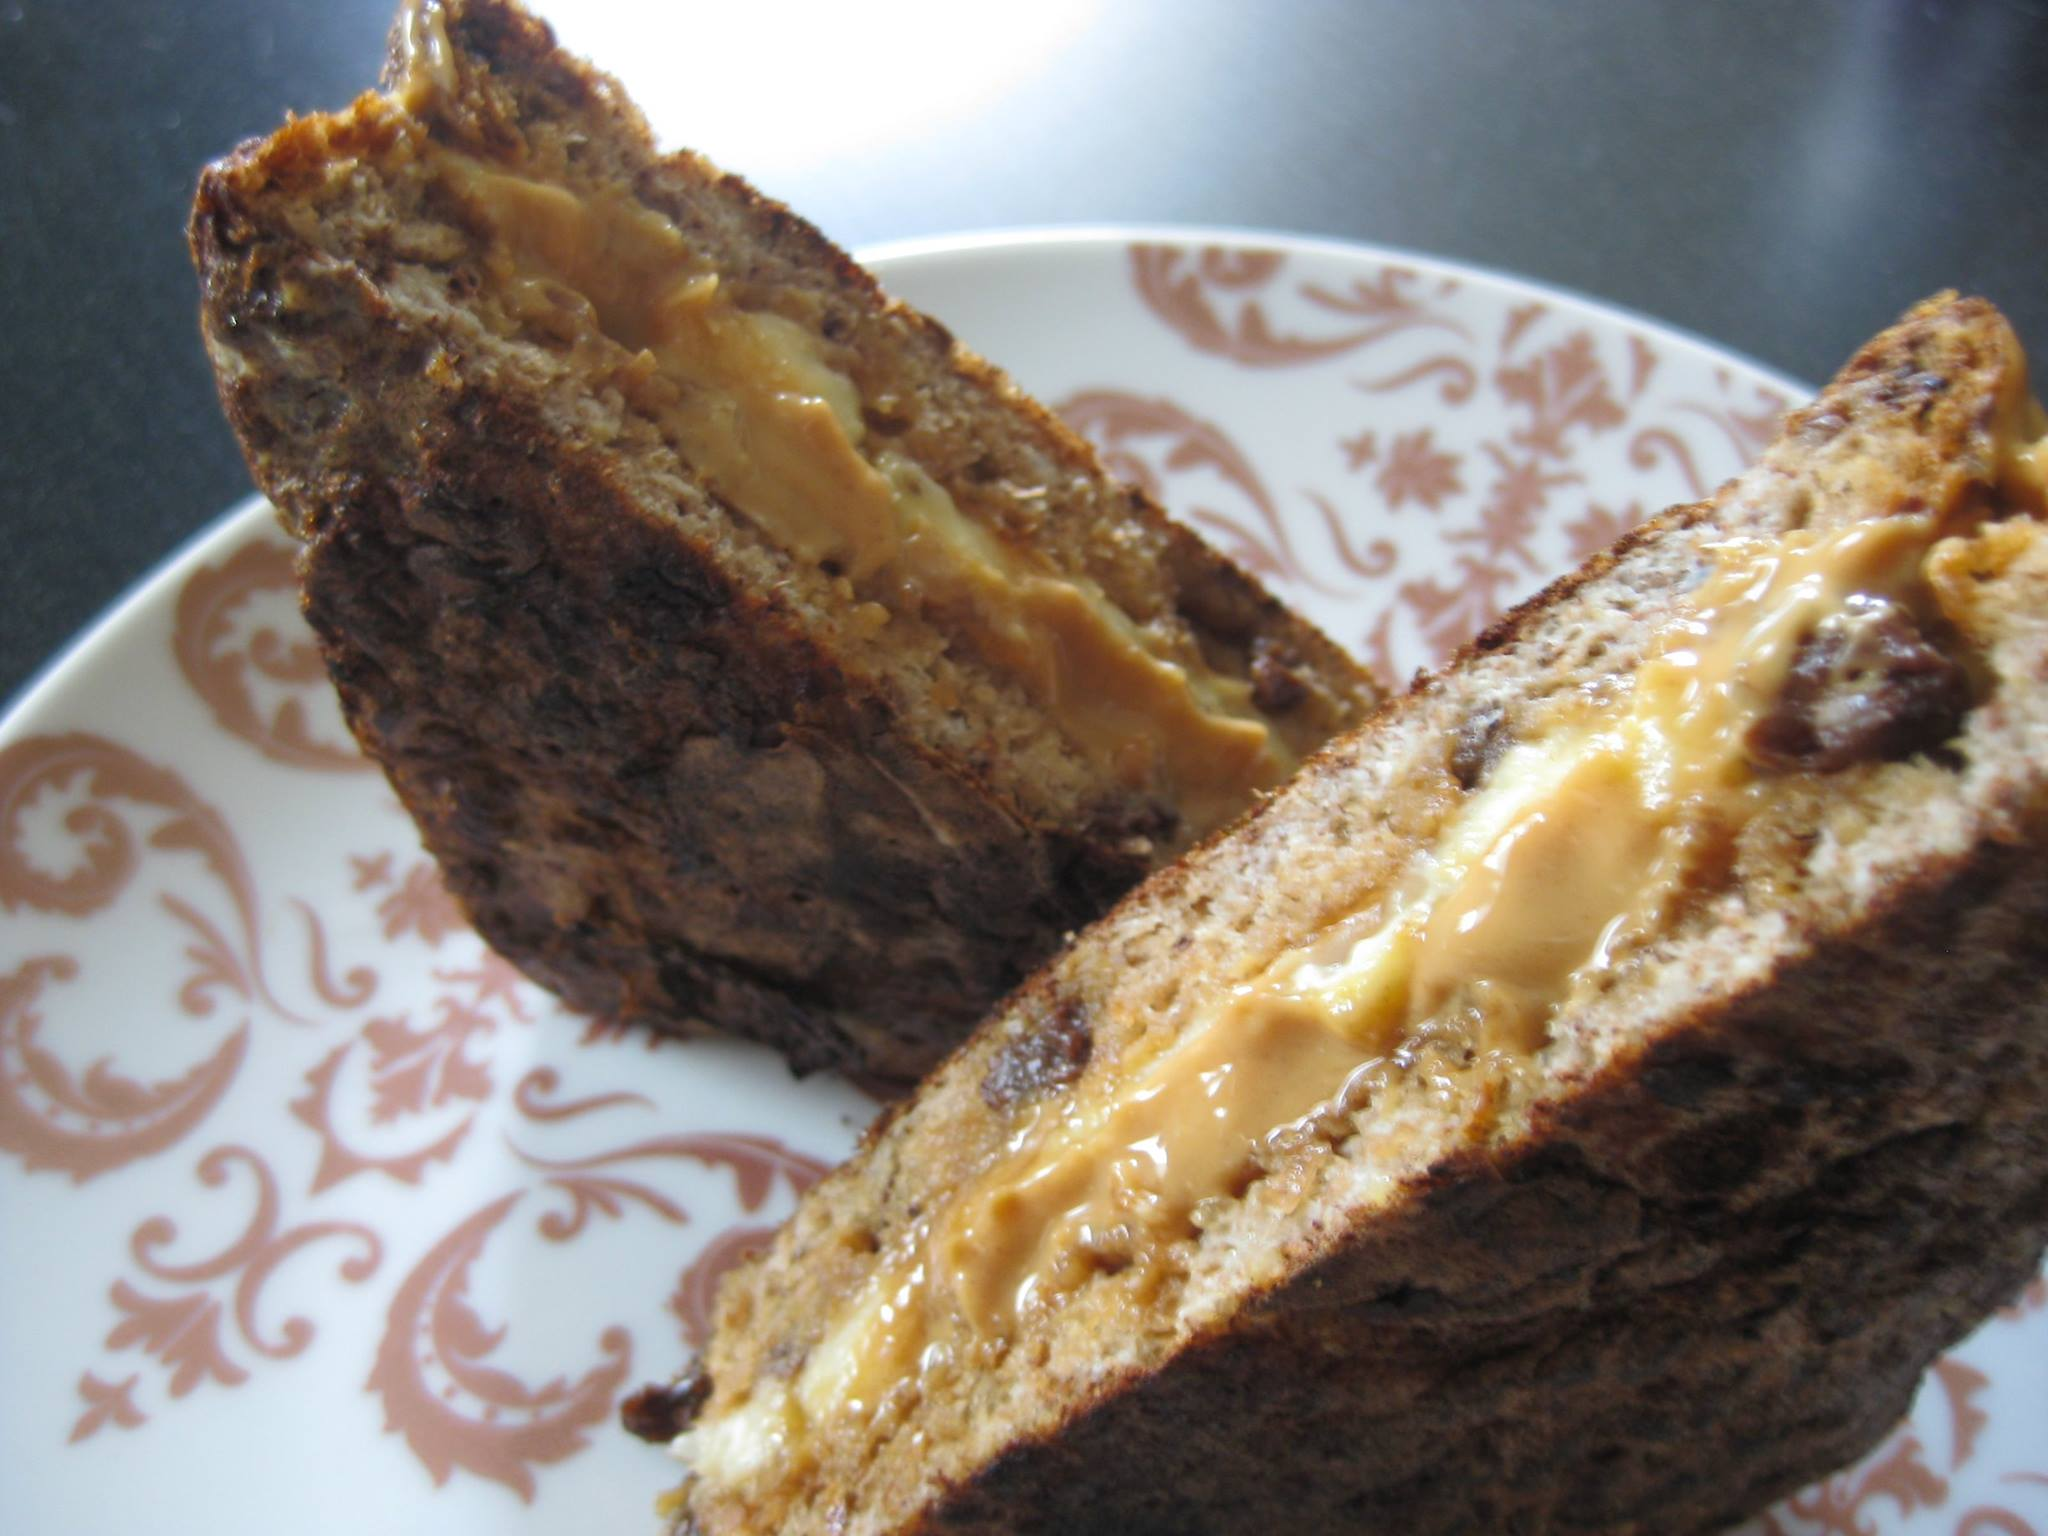 Stuffed Cinnamon Raisin Ezekiel Bread French Toast | Nut Zez